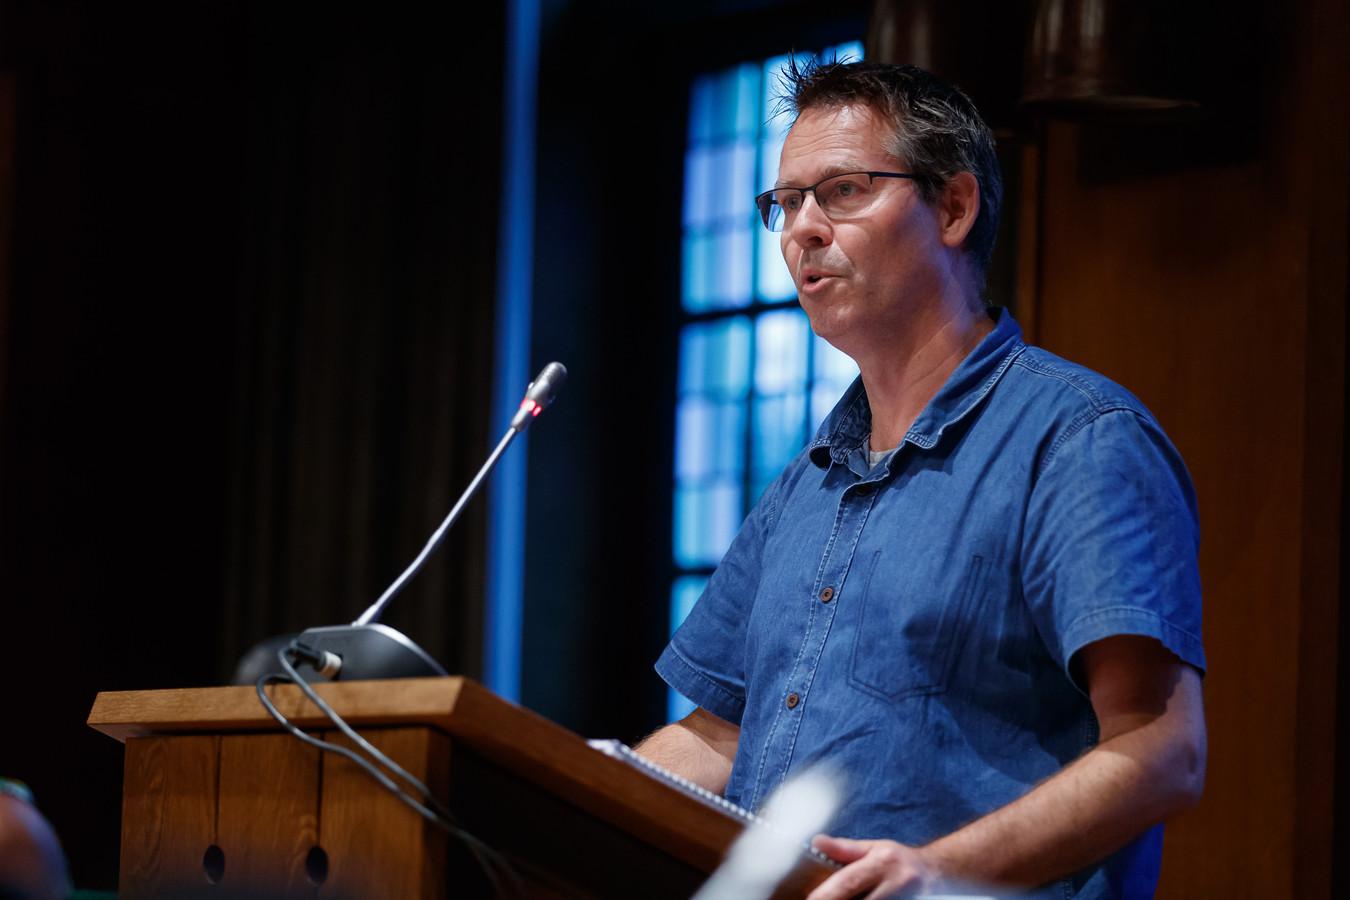 Peter Vissers, Breda '97